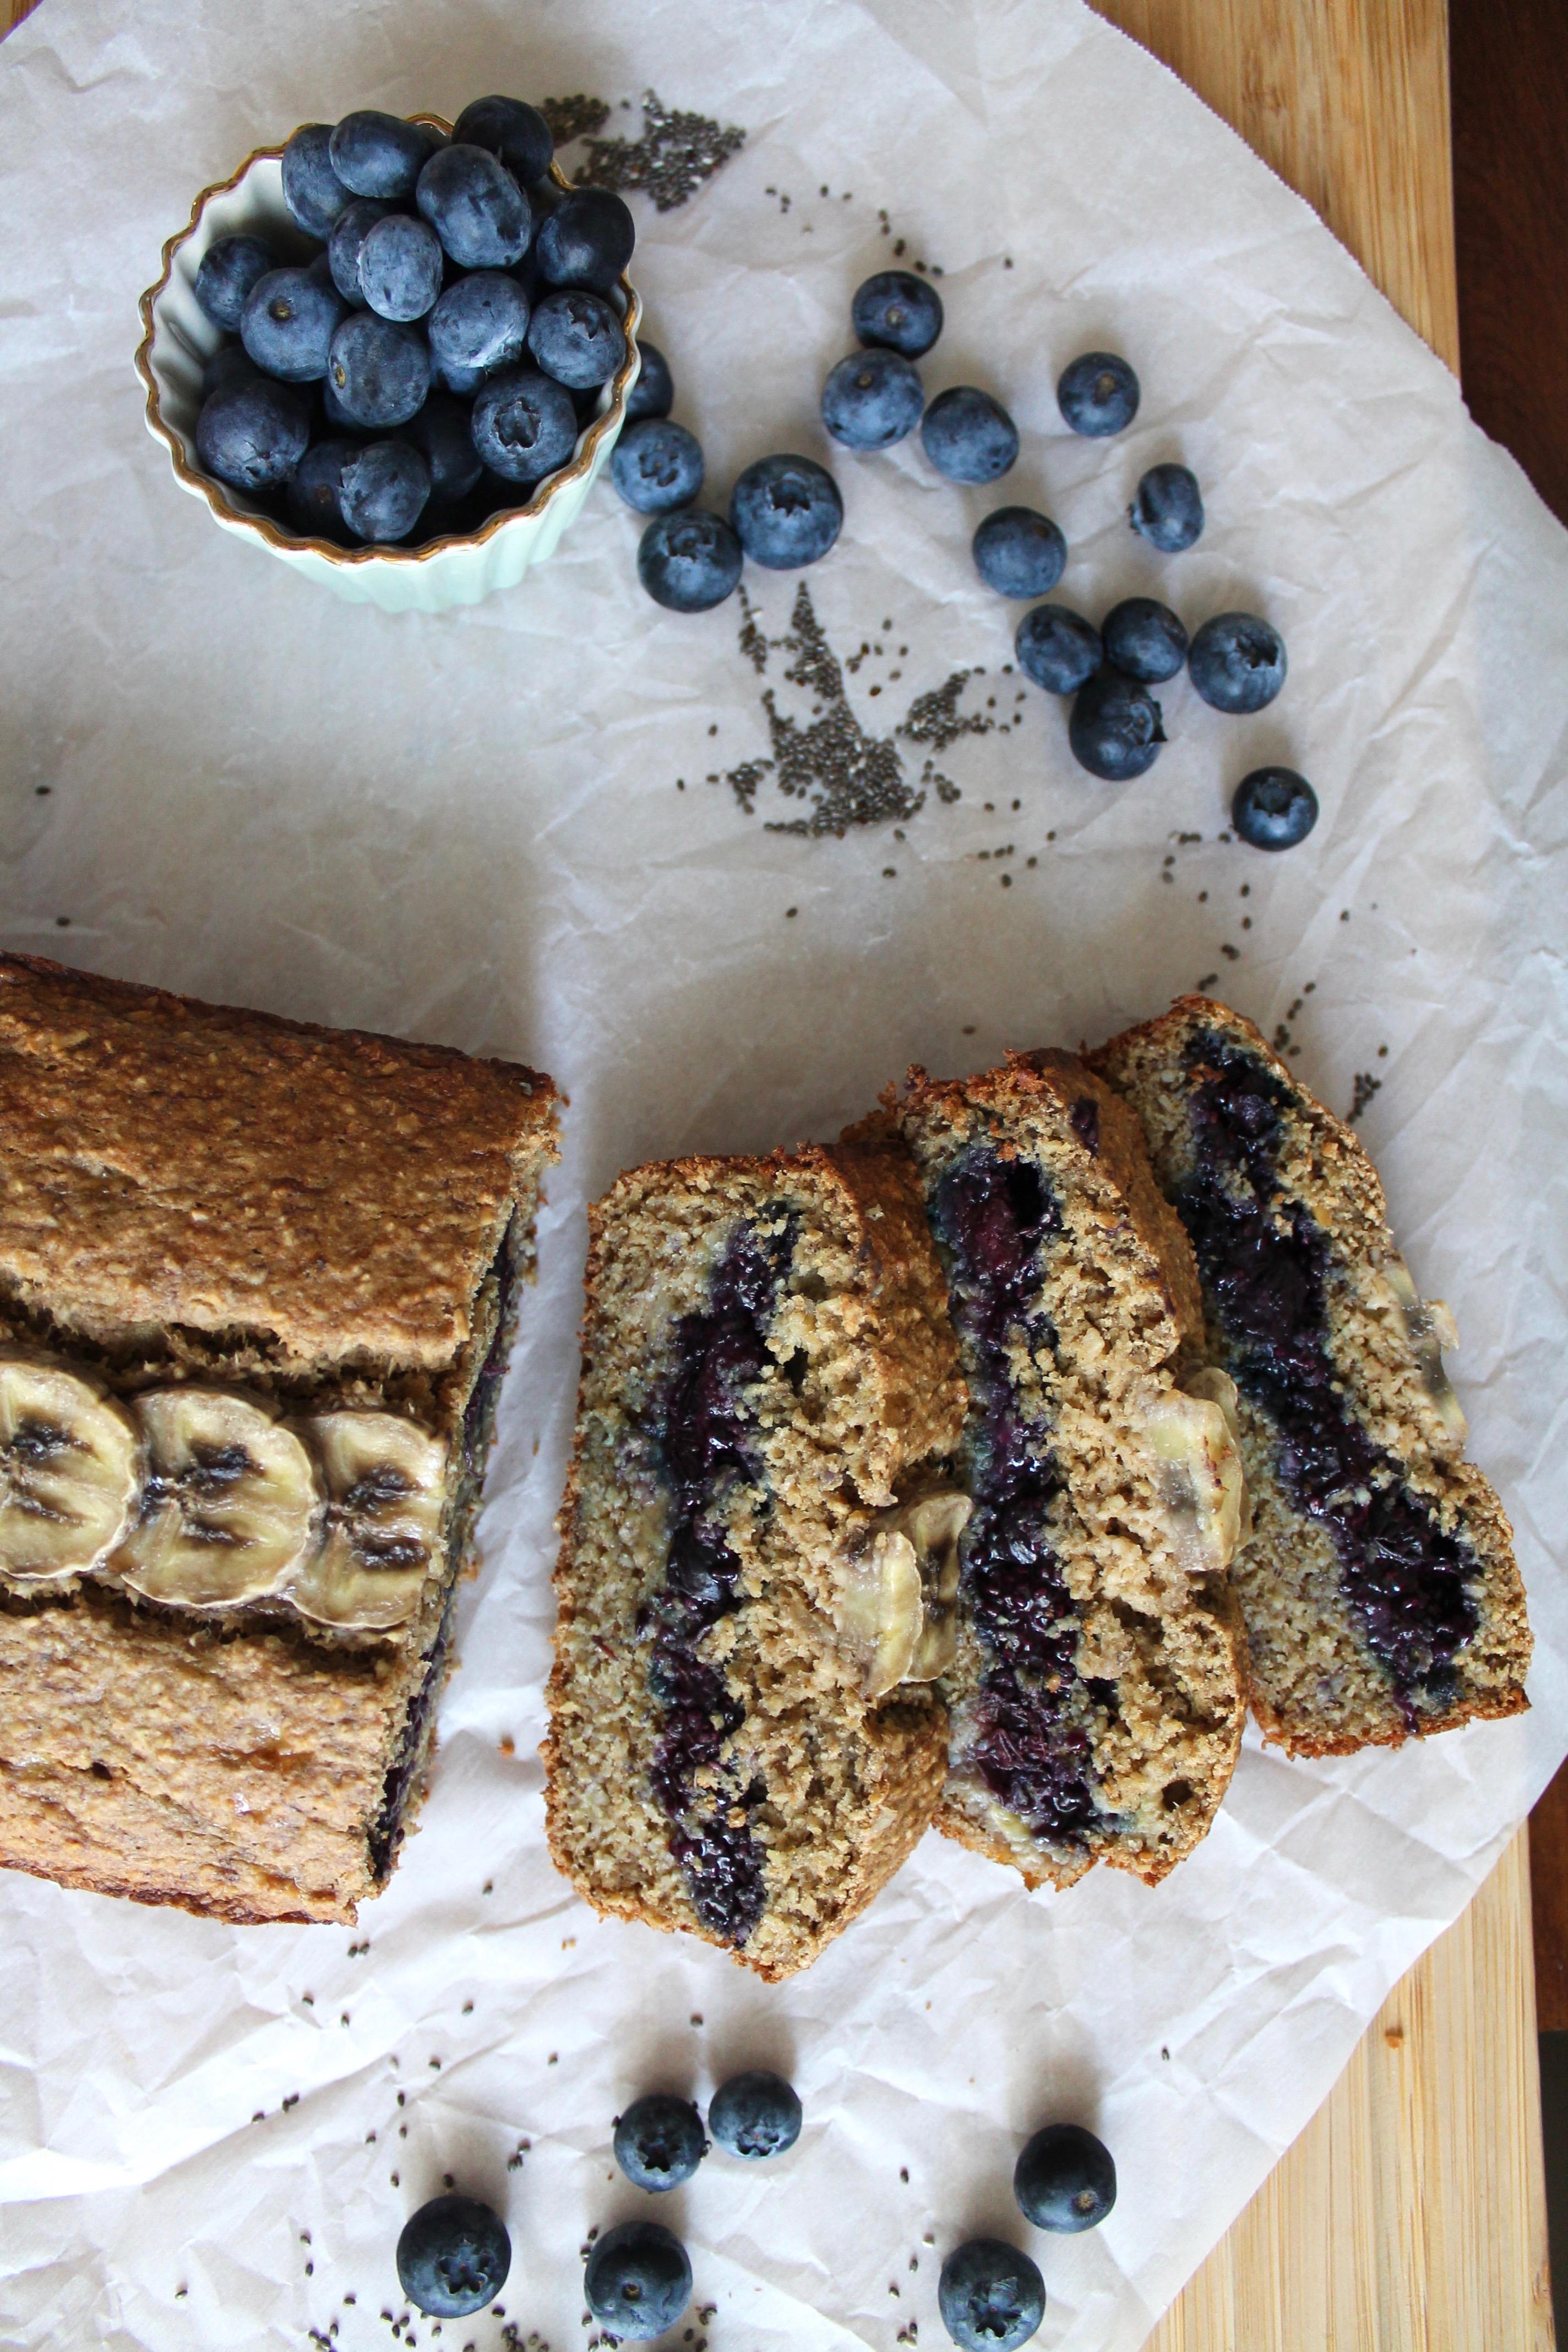 Blueberry Chia Jam Stuffed Oatmeal Banana Bread (gf)